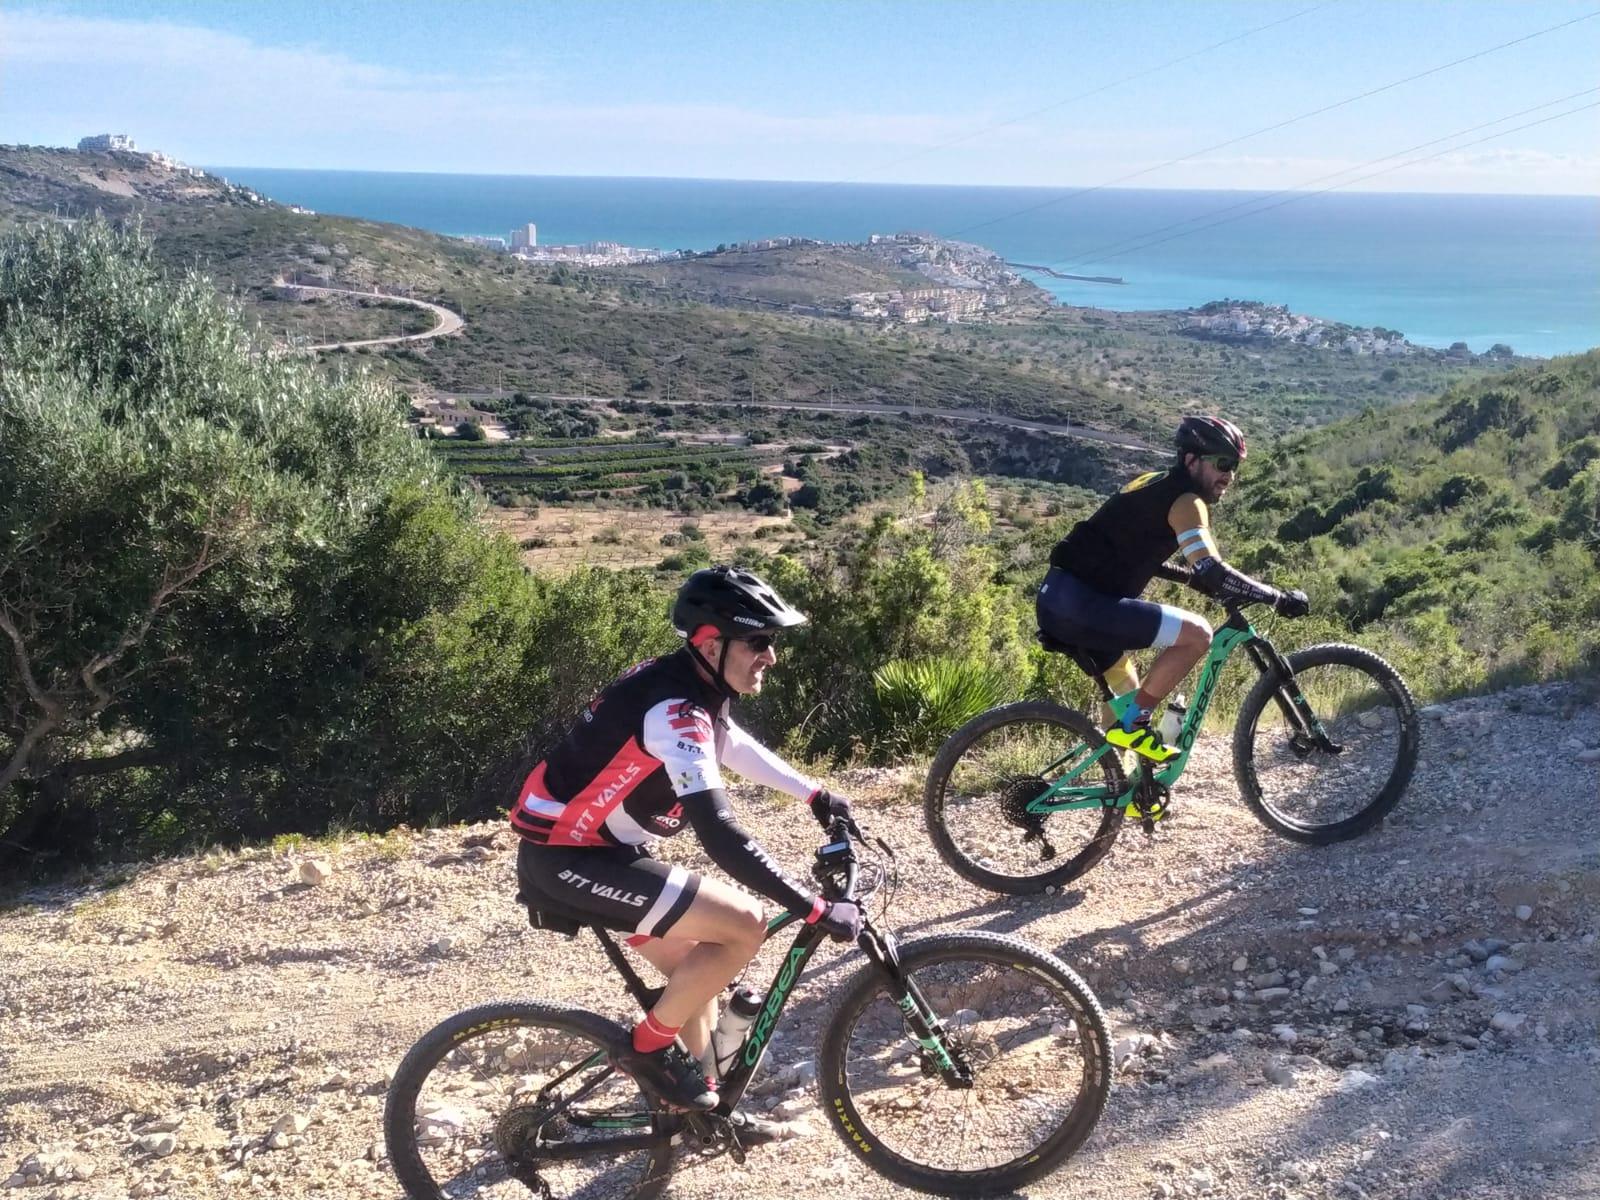 séjour_à_vélo_stage_cyclistes_espagne_vtt_mountainbike_cycling_mtb_viajes_bici_maestrat_peñíscola_peniscola_sant_antoni